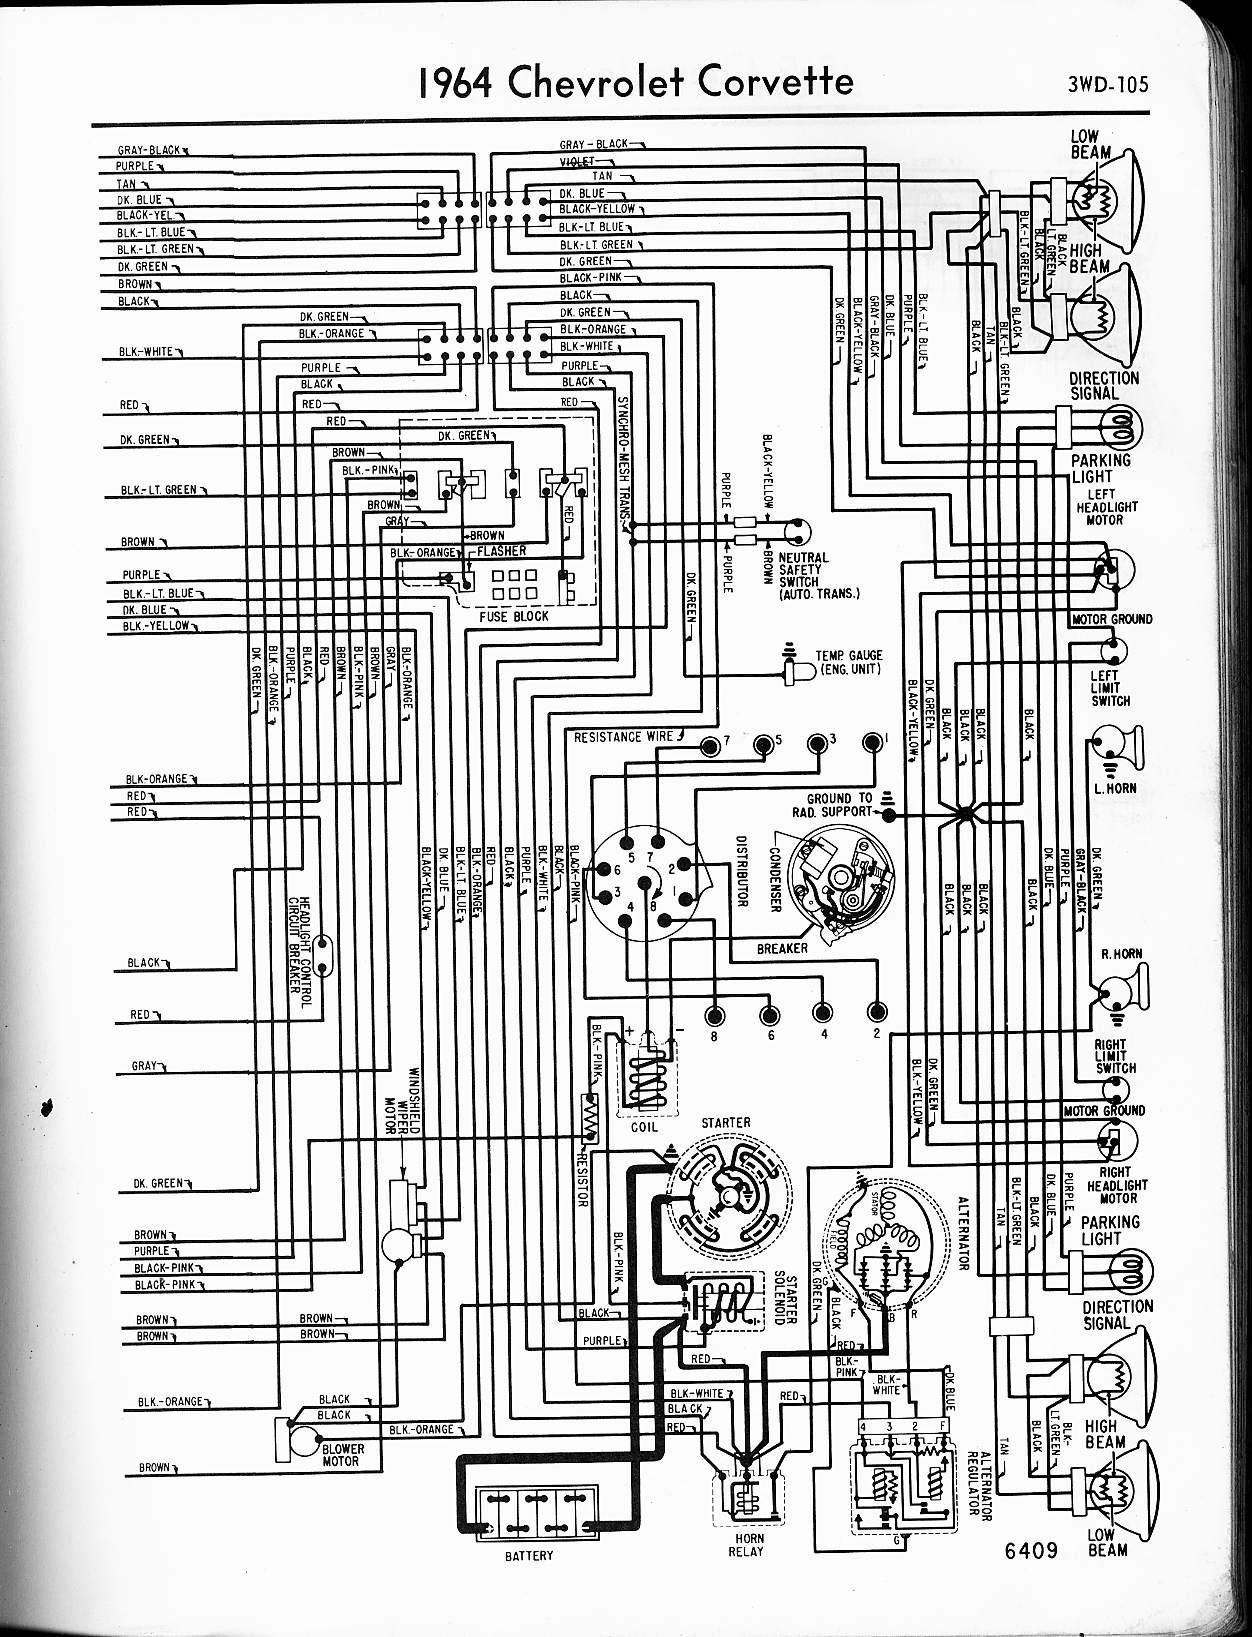 [DIAGRAM_3NM]  63 Falcon Wiring Diagram Geil Kiln Controller Wiring Diagram -  masat.2.allianceconseil59.fr | Image 63 Vette Wiring Diagram |  | masat.2.allianceconseil59.fr